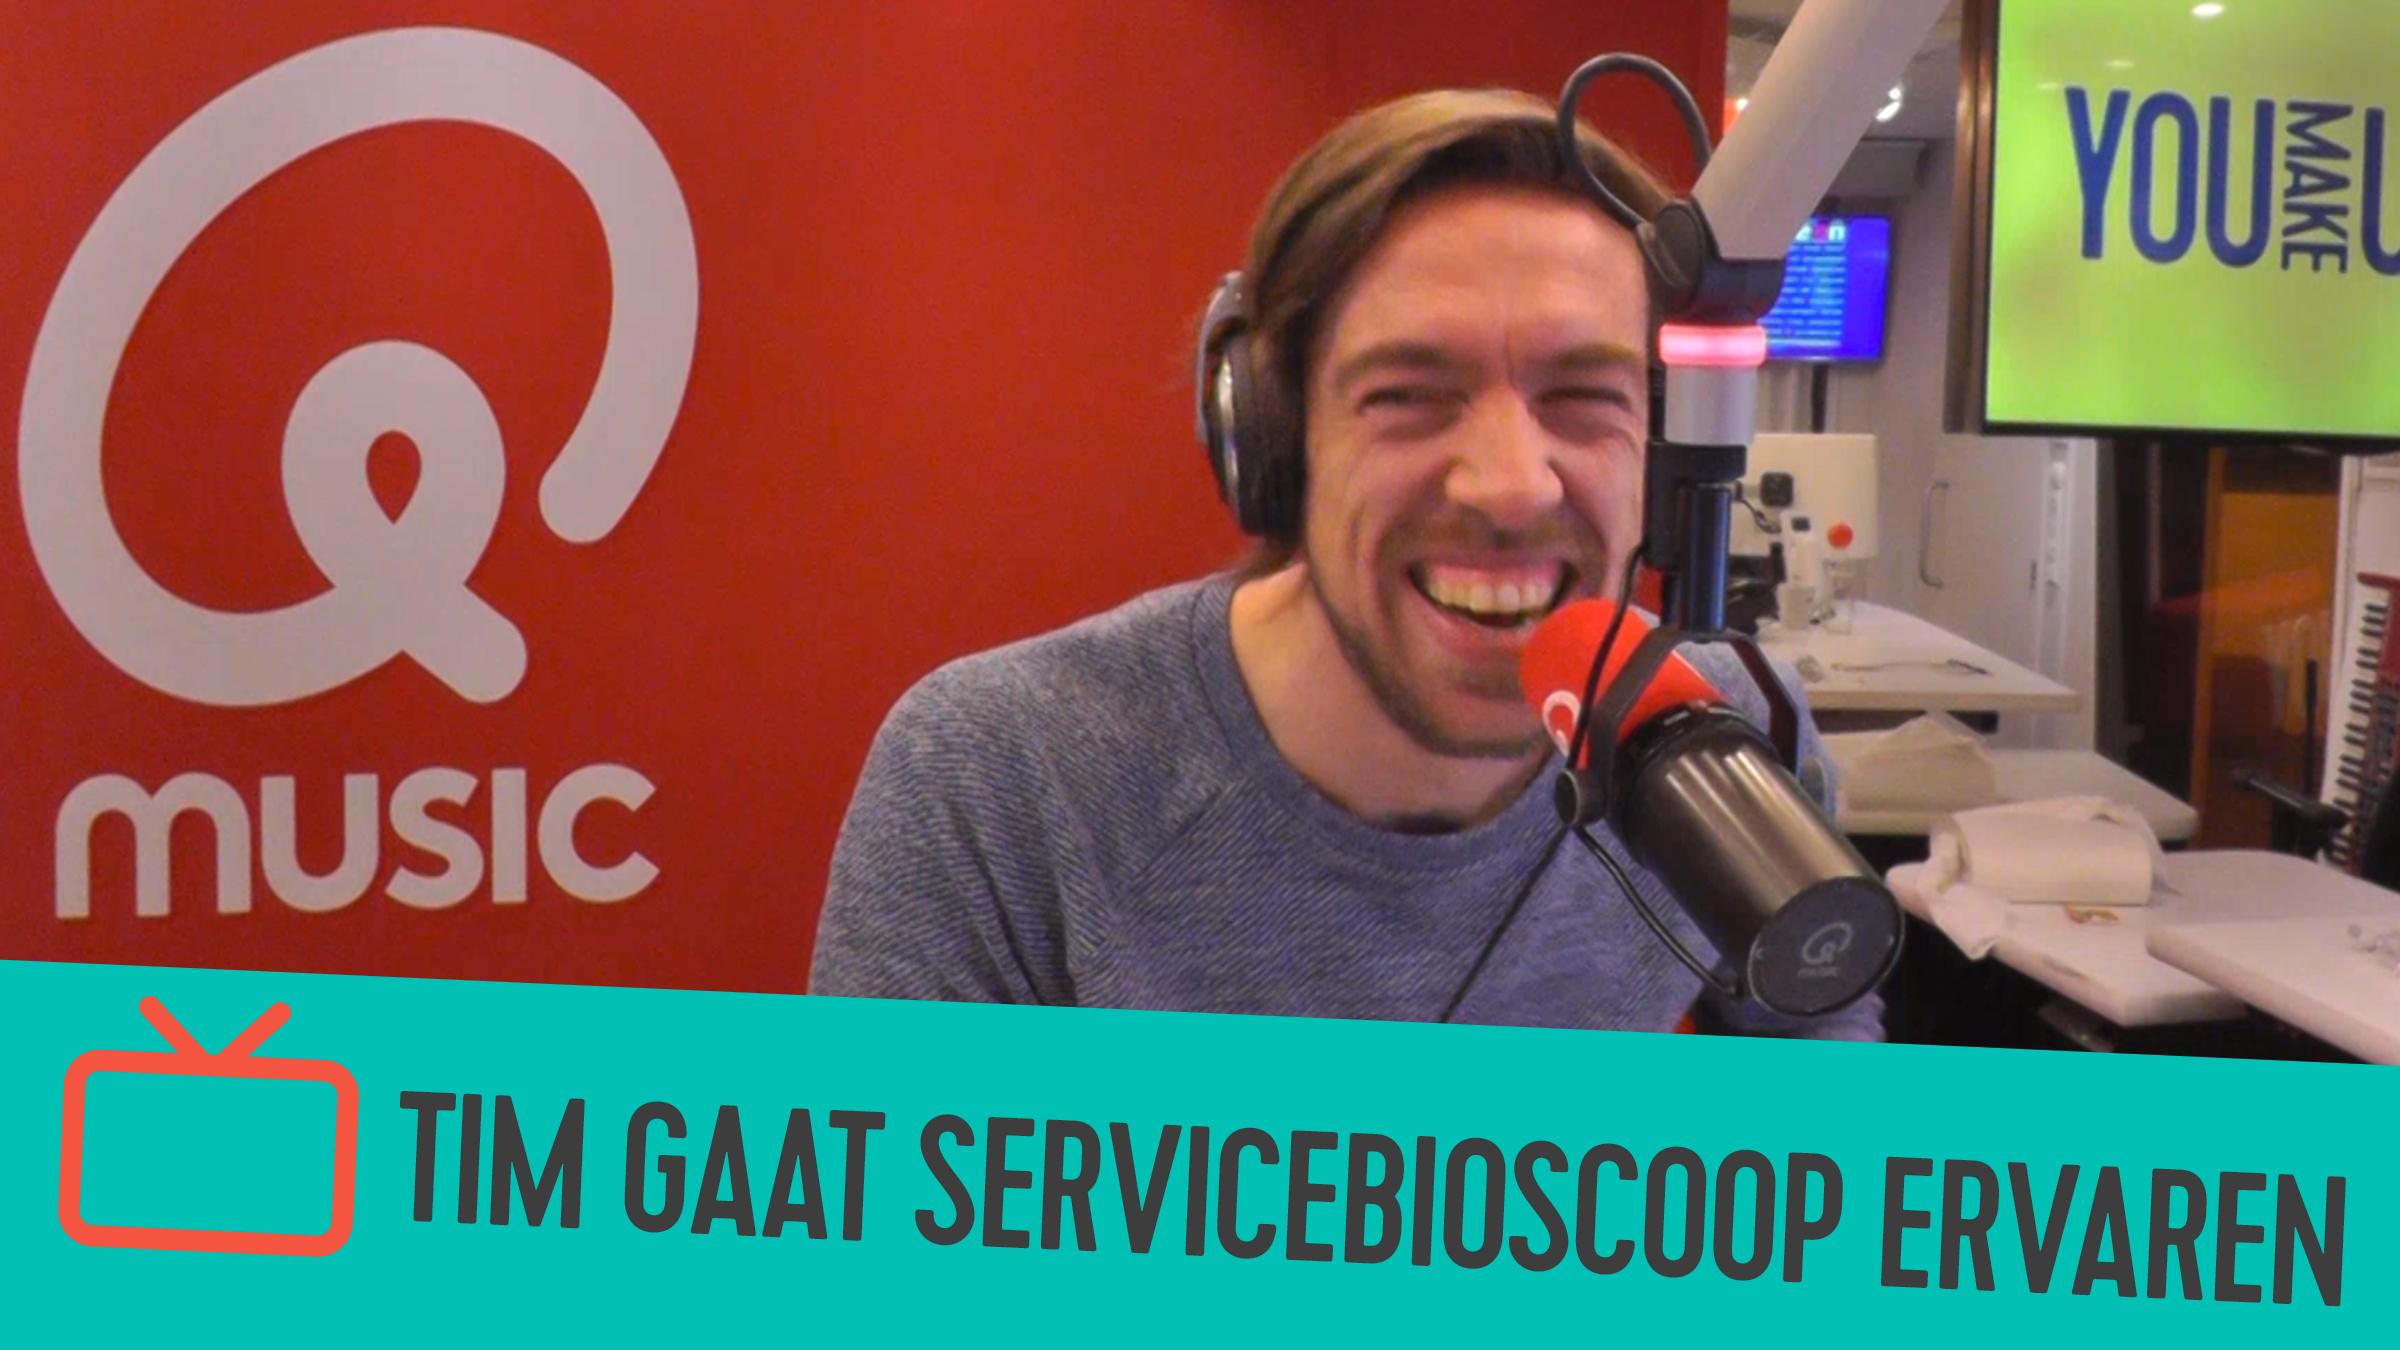 Servicebioscoop